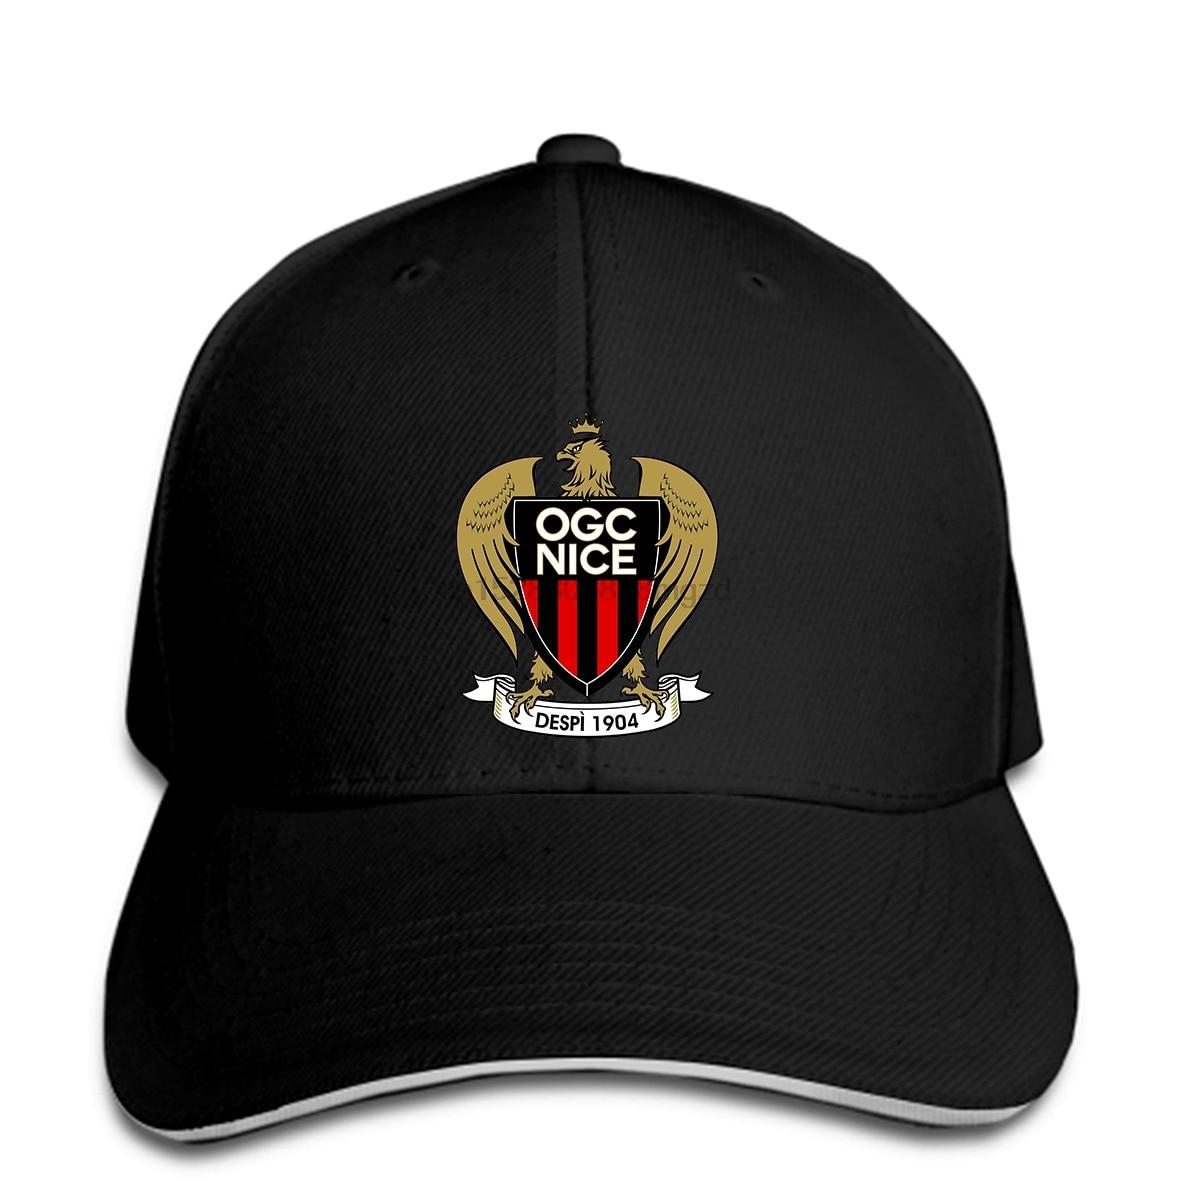 OGC Nice Les Aiglons France Ligue Football Soccer Football Men Baseball Cap Team Sports Snapback Cap Women Hat Peaked